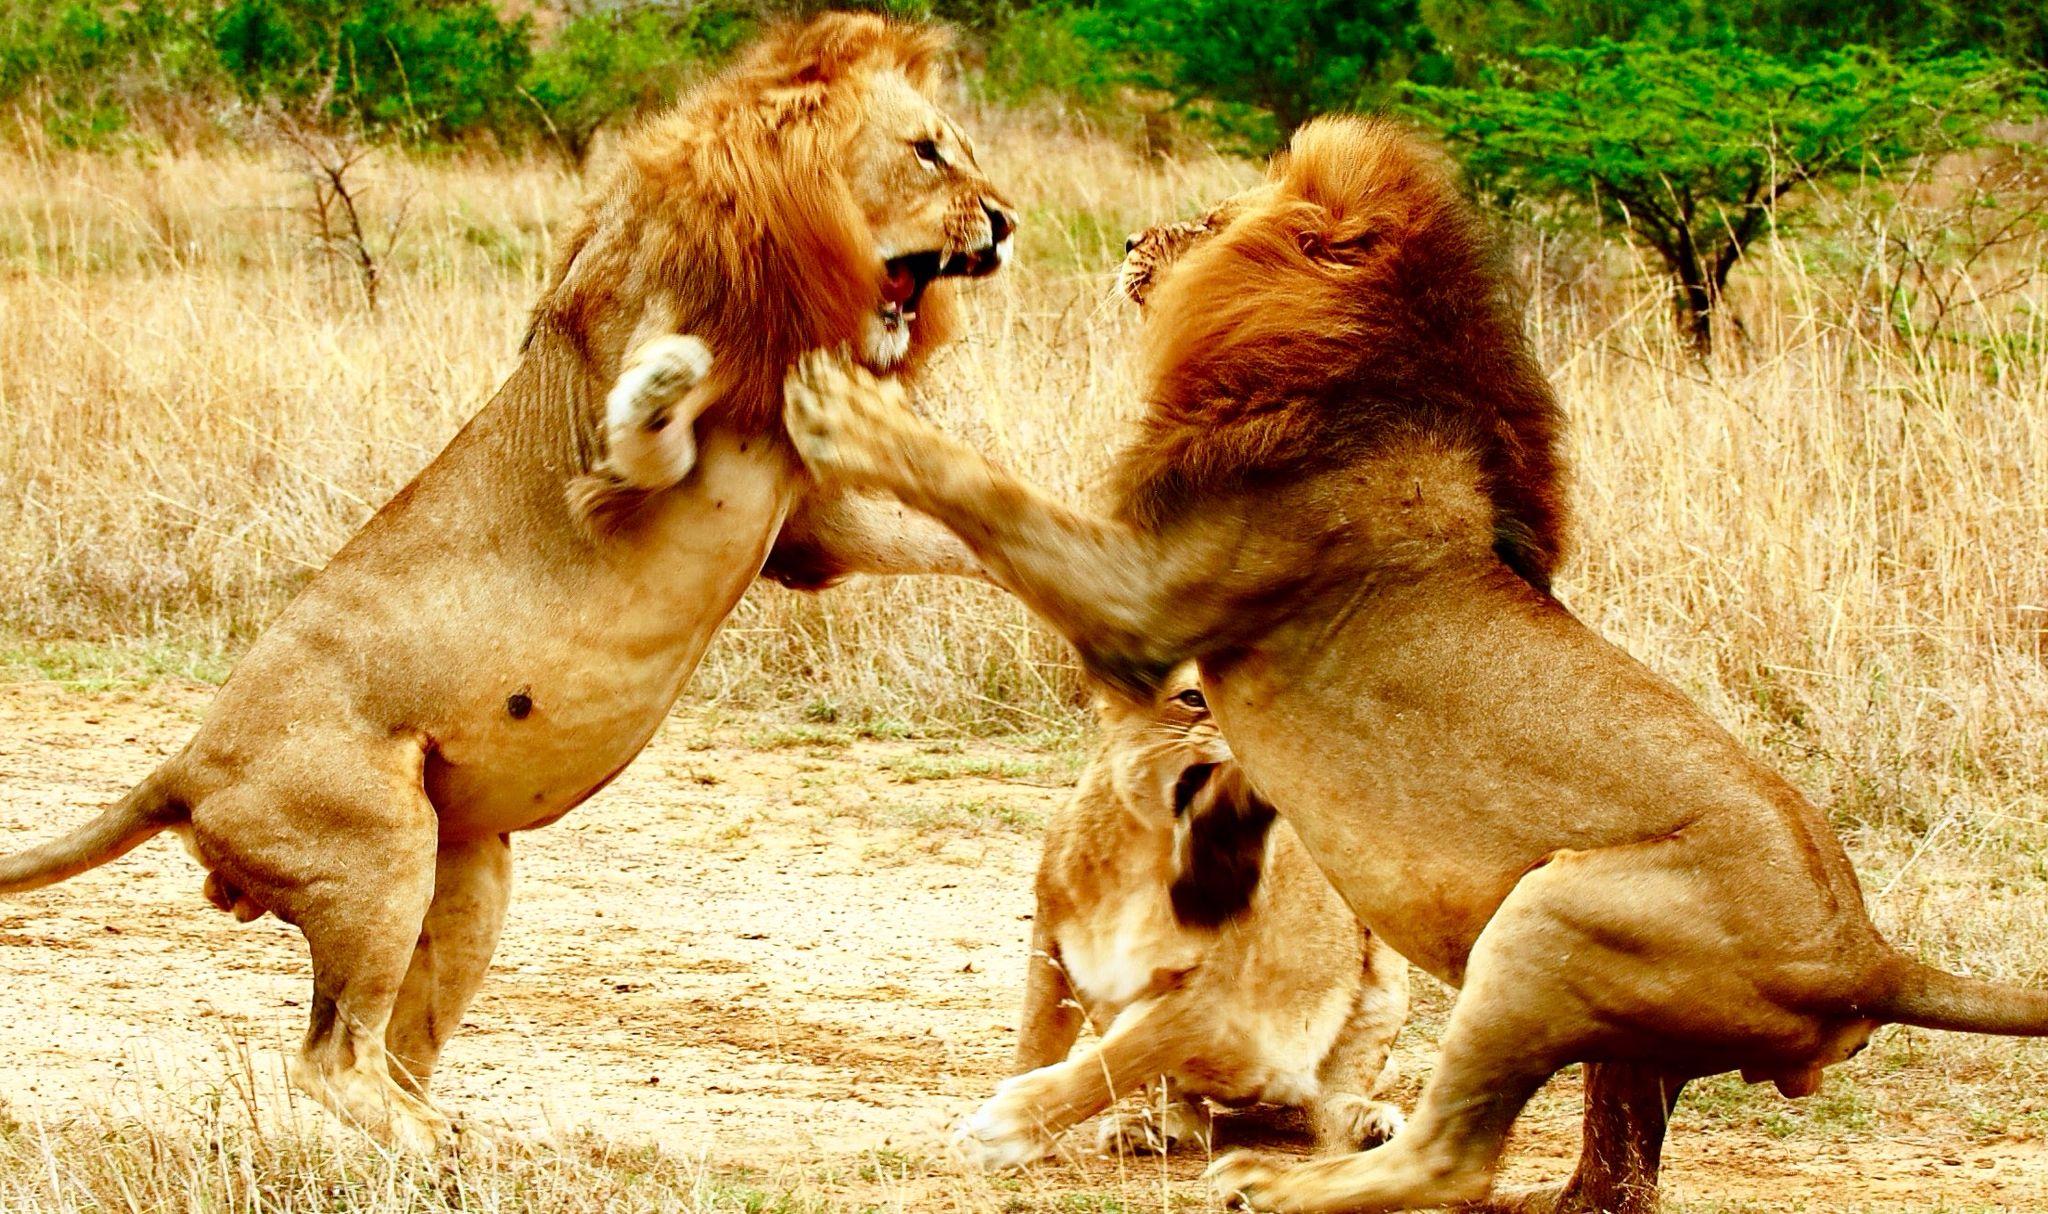 Lions fighting! | Animals wild, Wild animals photos, Lion vs lion